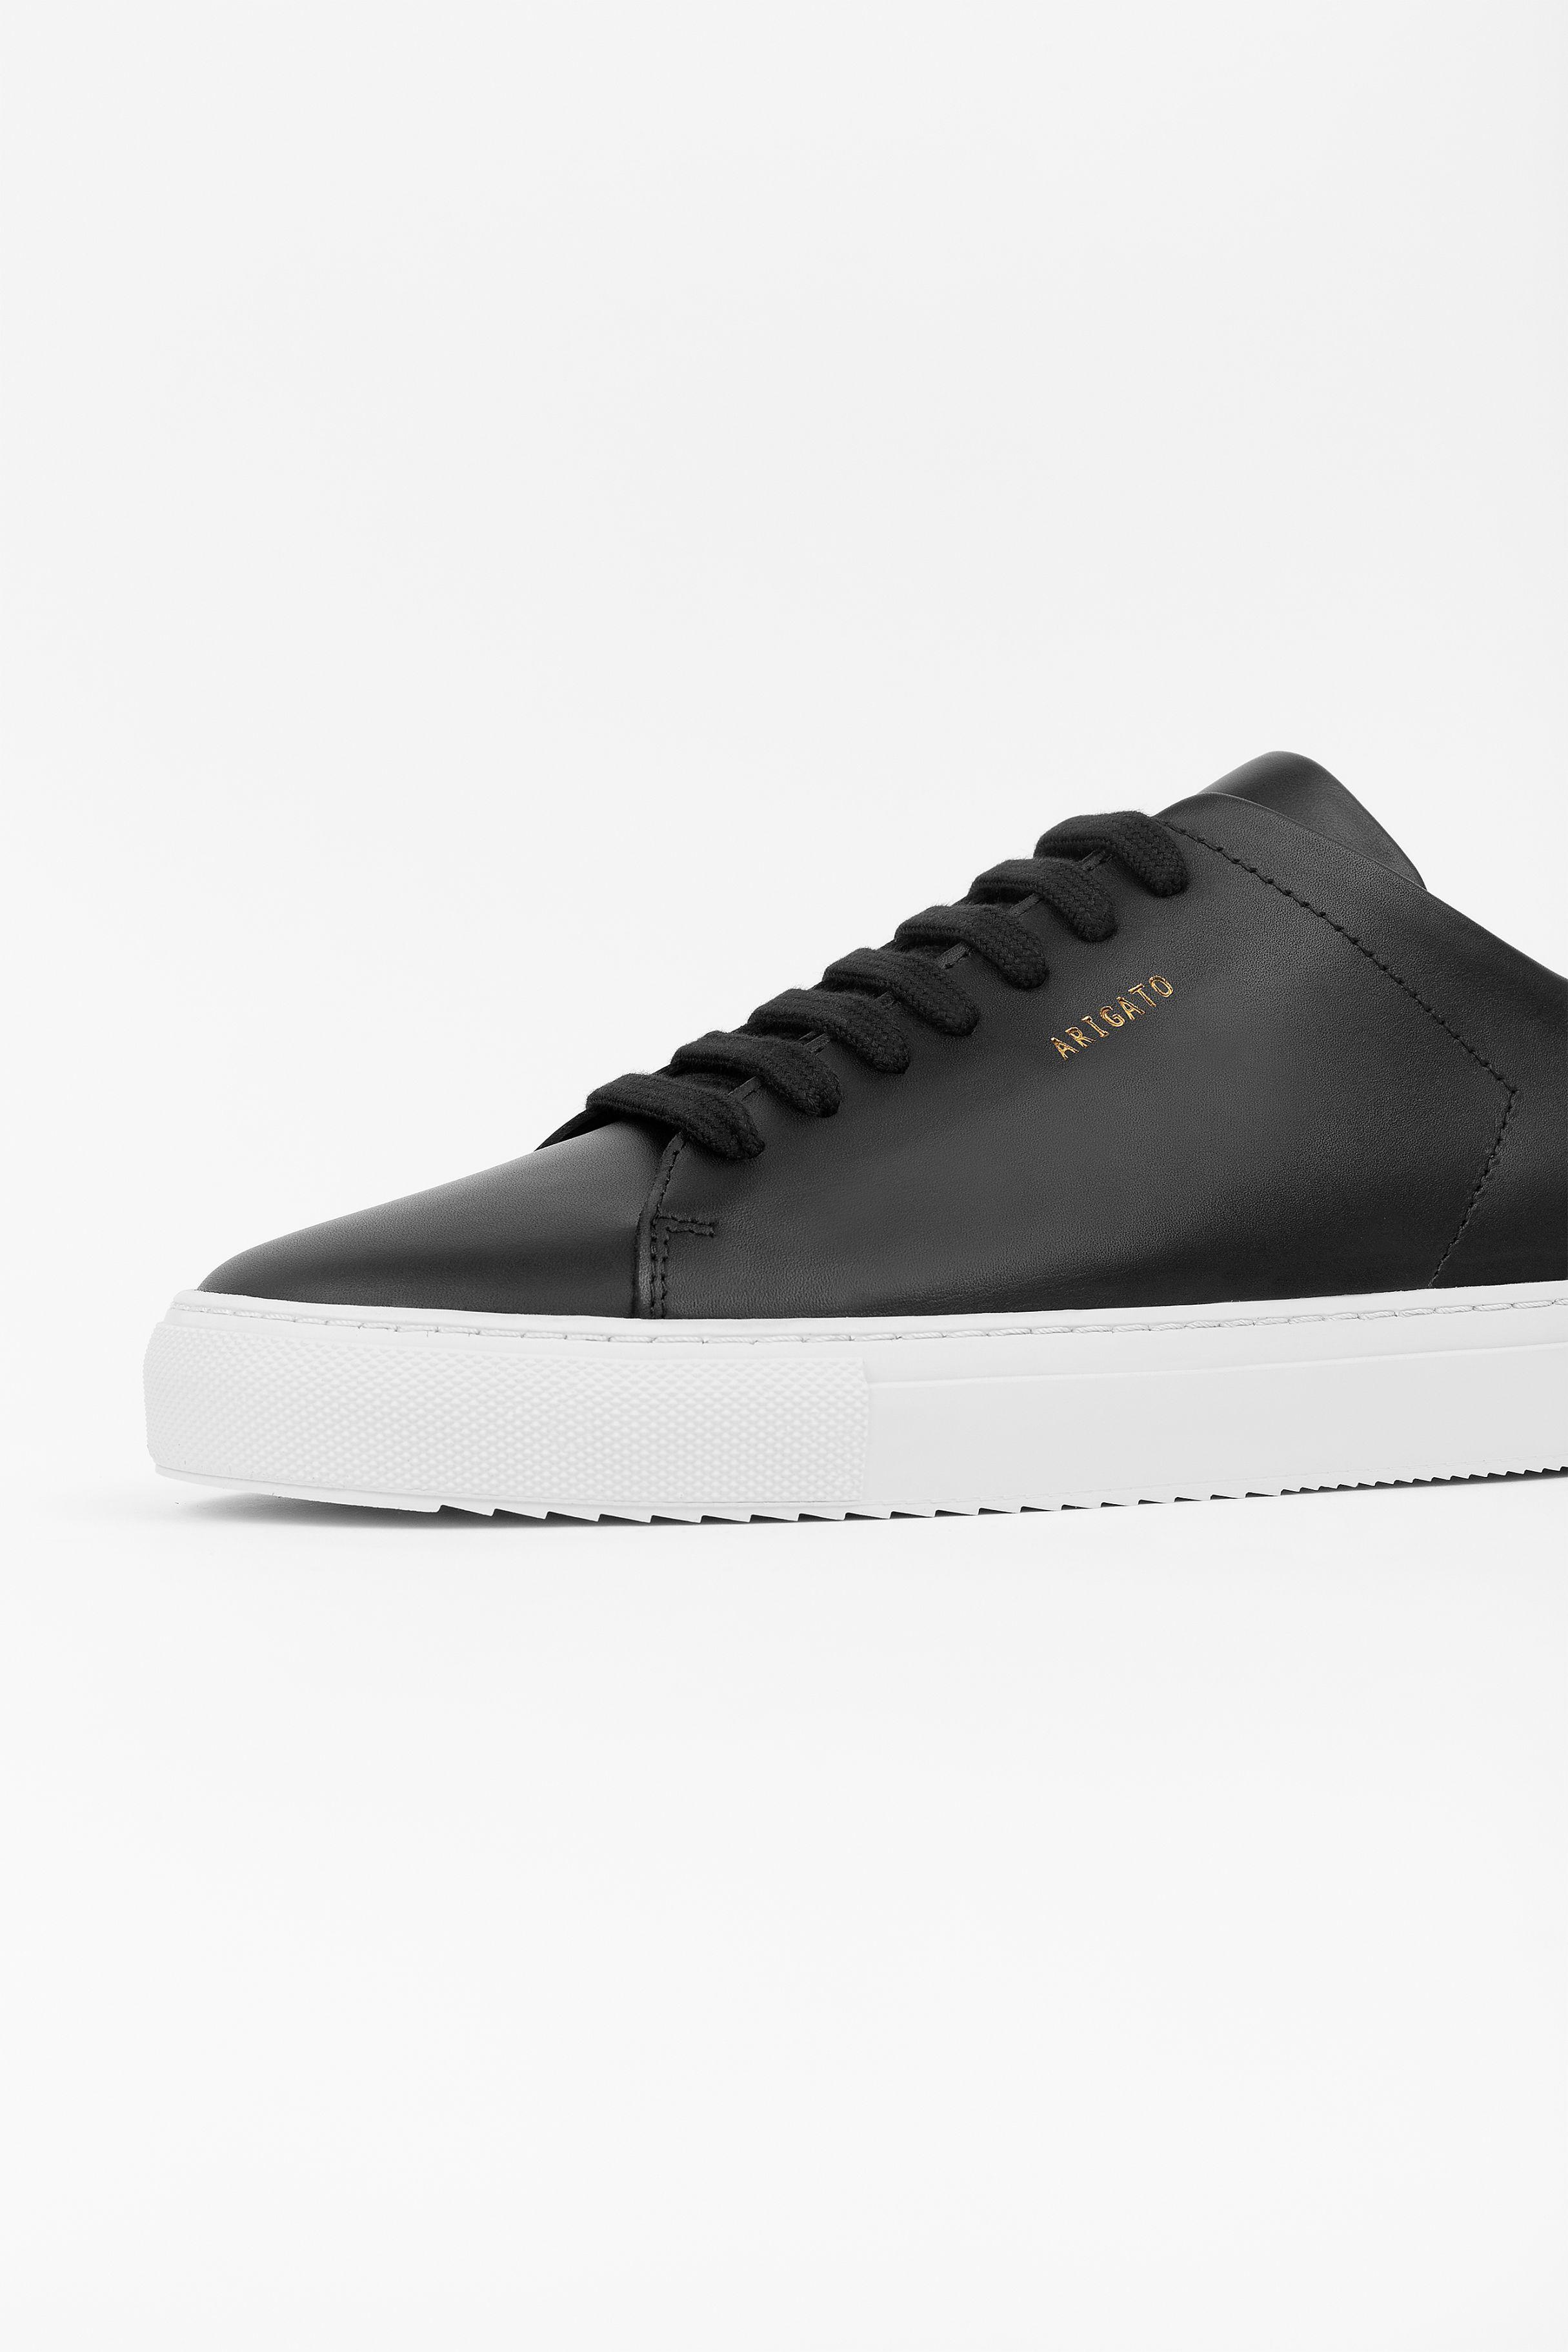 Axel Arigato Clean 90 Sneaker | Worth